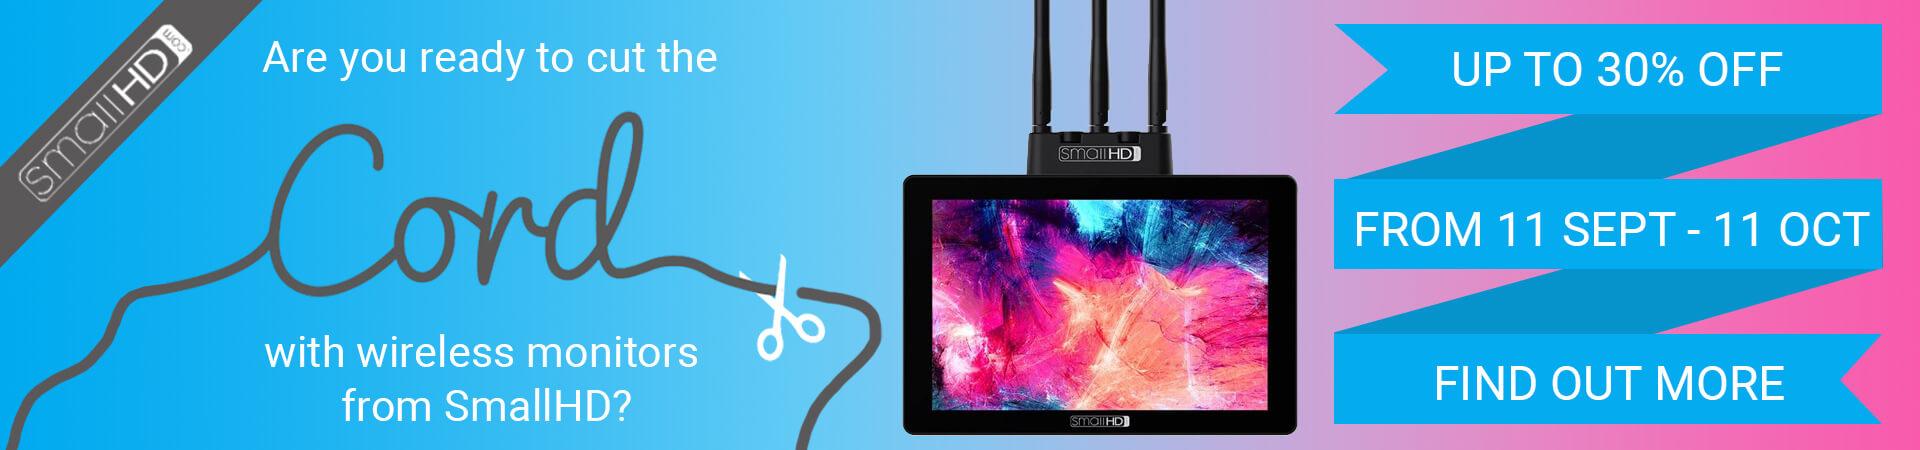 SmallHD Wireless Monitor Promotion